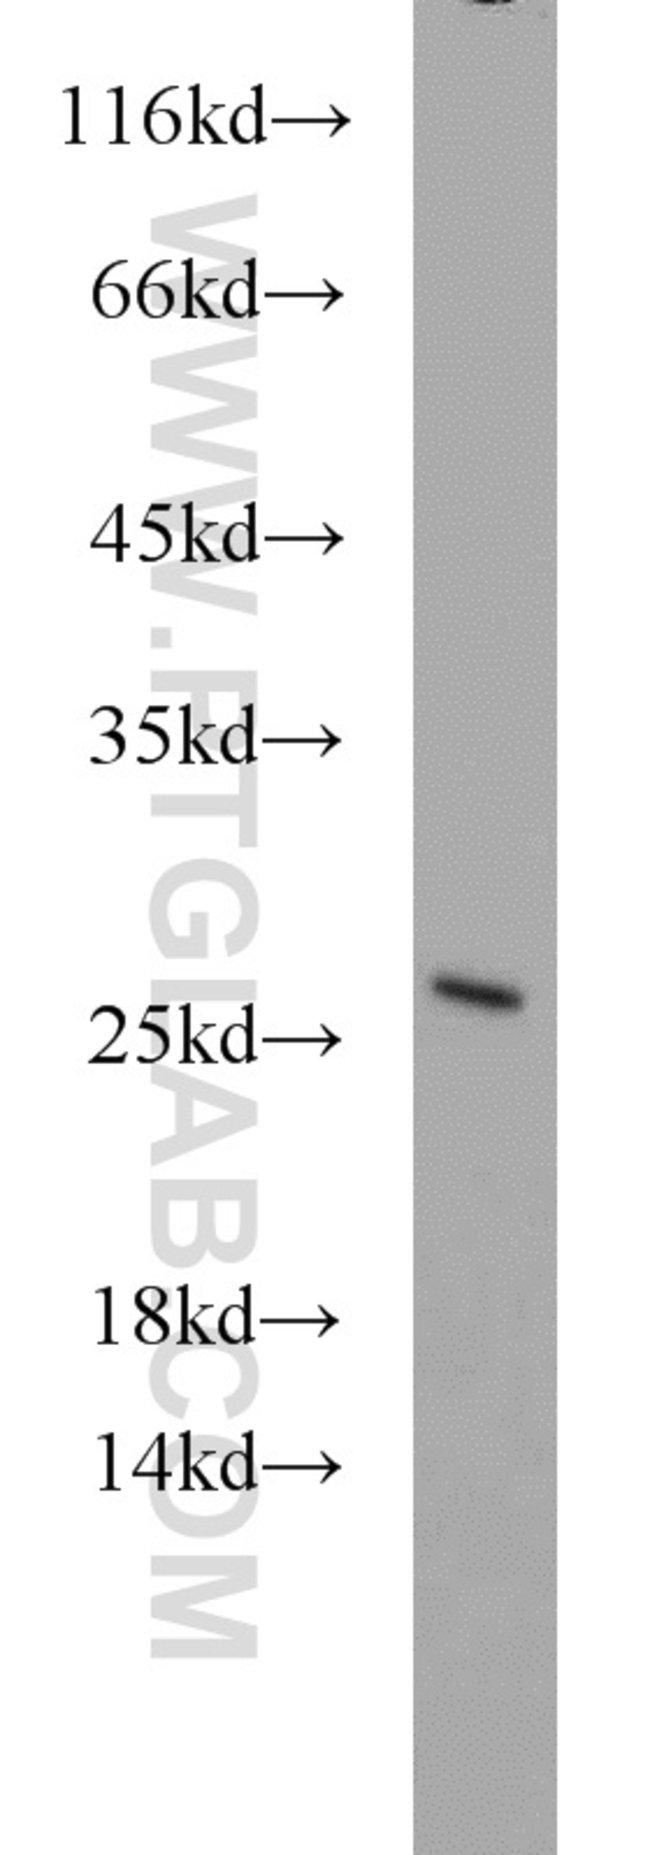 GADD45GIP1 Rabbit anti-Human, Mouse, Rat, Polyclonal, Proteintech 20 μL; Unconjugated Ver productos